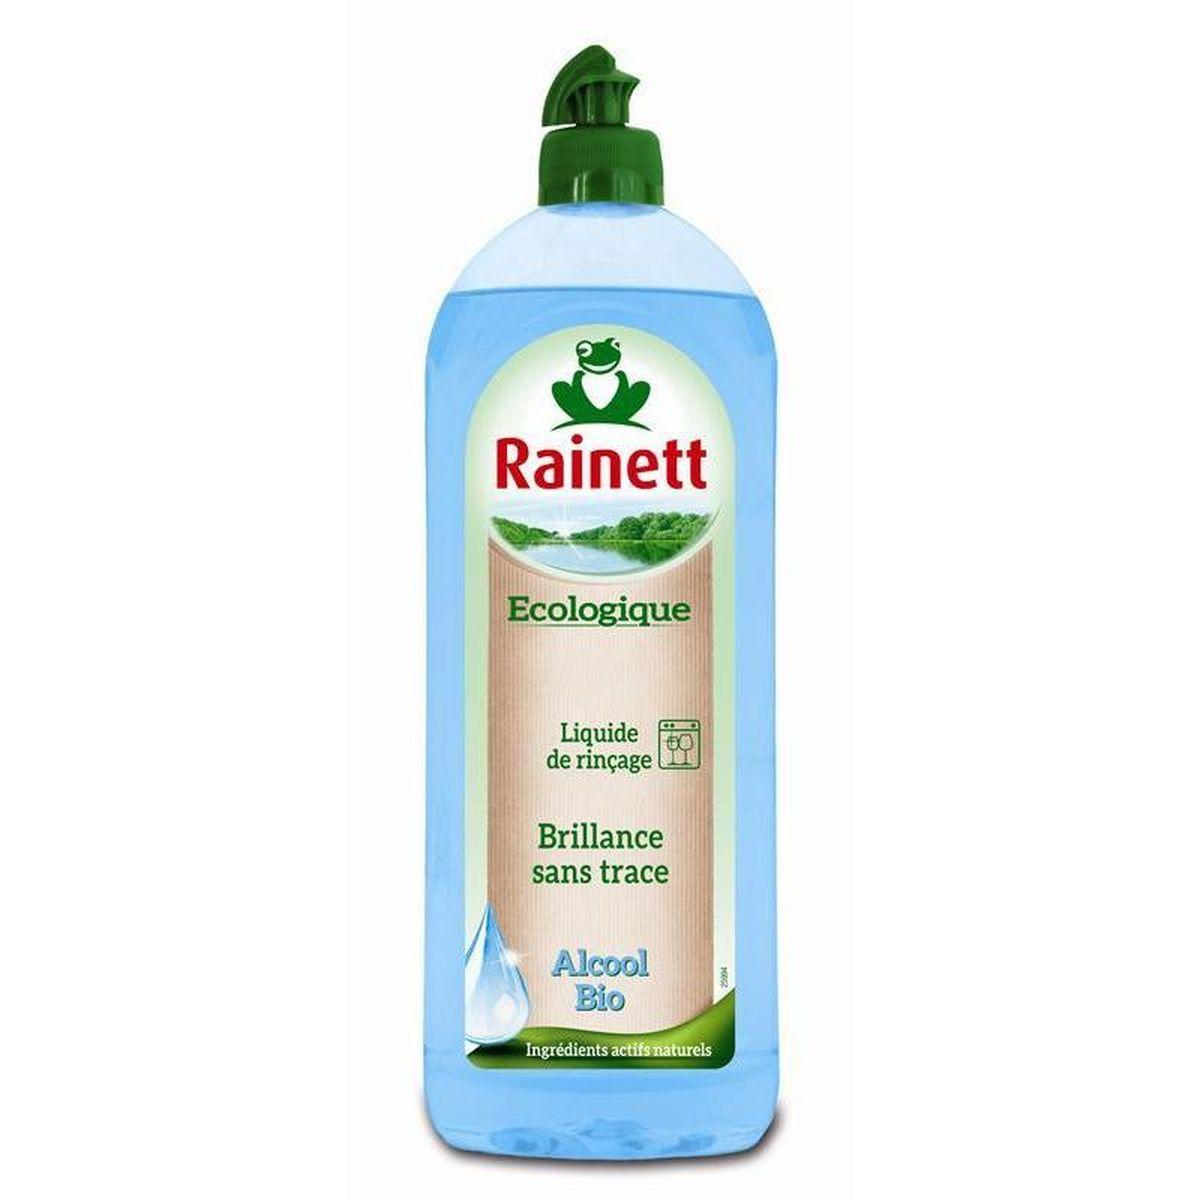 rainett liquide rinçage, 750ml : houra.fr